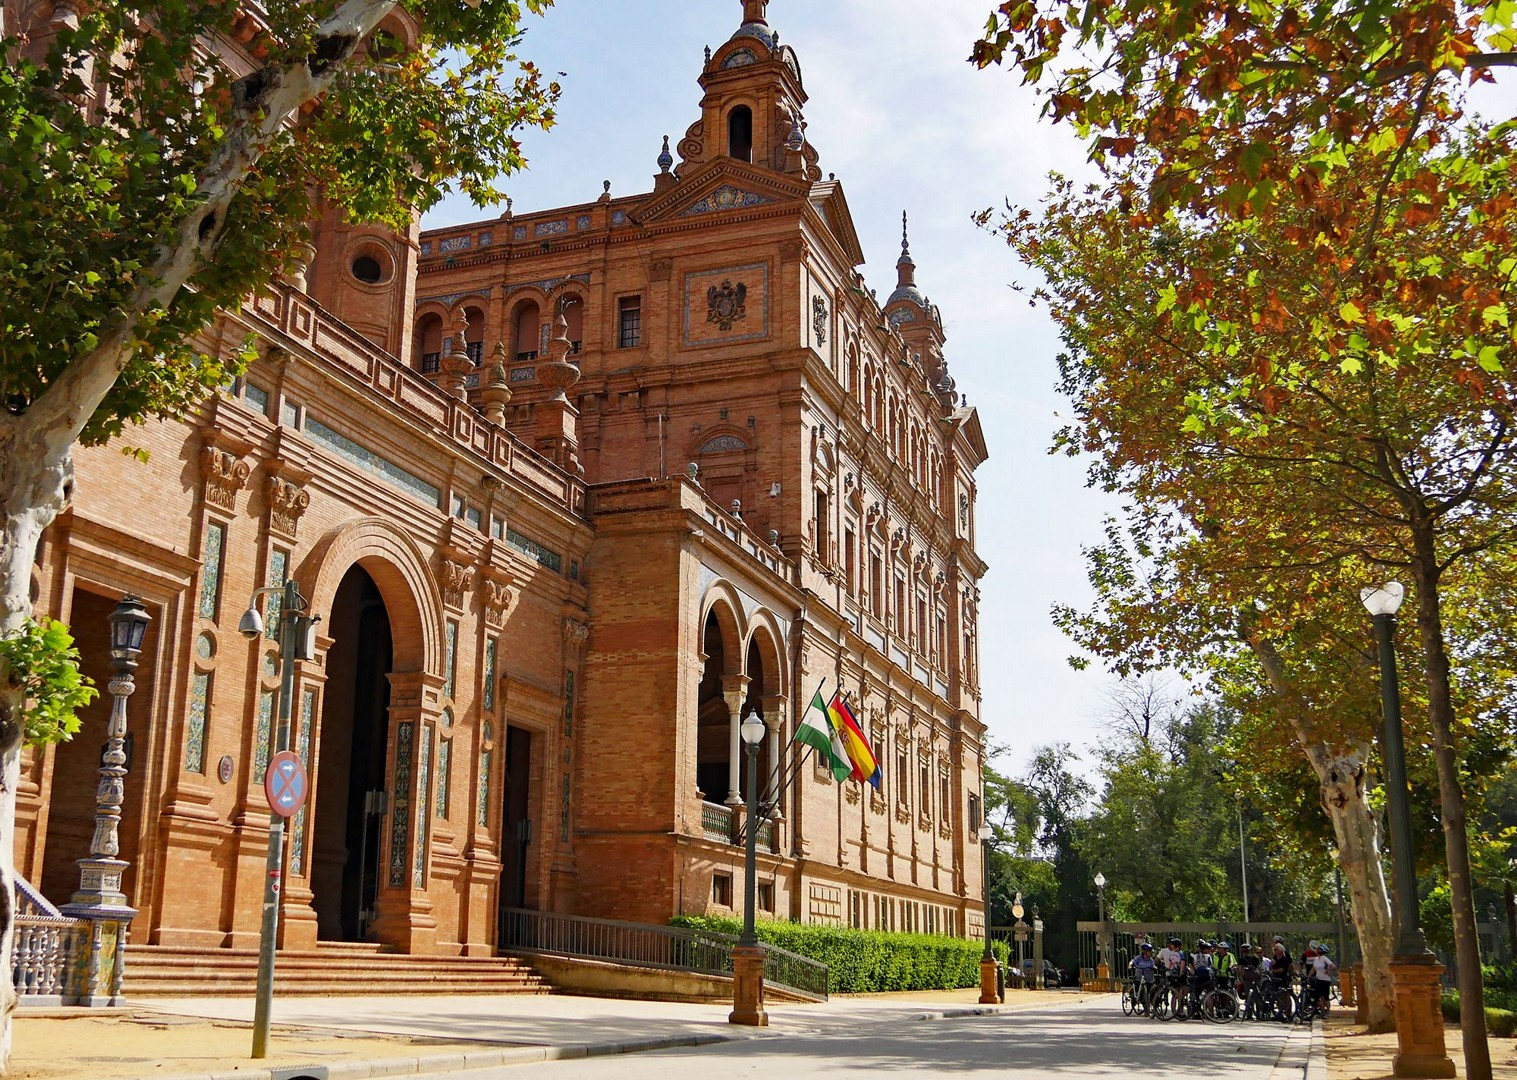 spain-granada-to-seville-cycling-holiday.jpg - Southern Spain - Granada to Seville - Self-Guided Leisure Cycling Holiday - Leisure Cycling